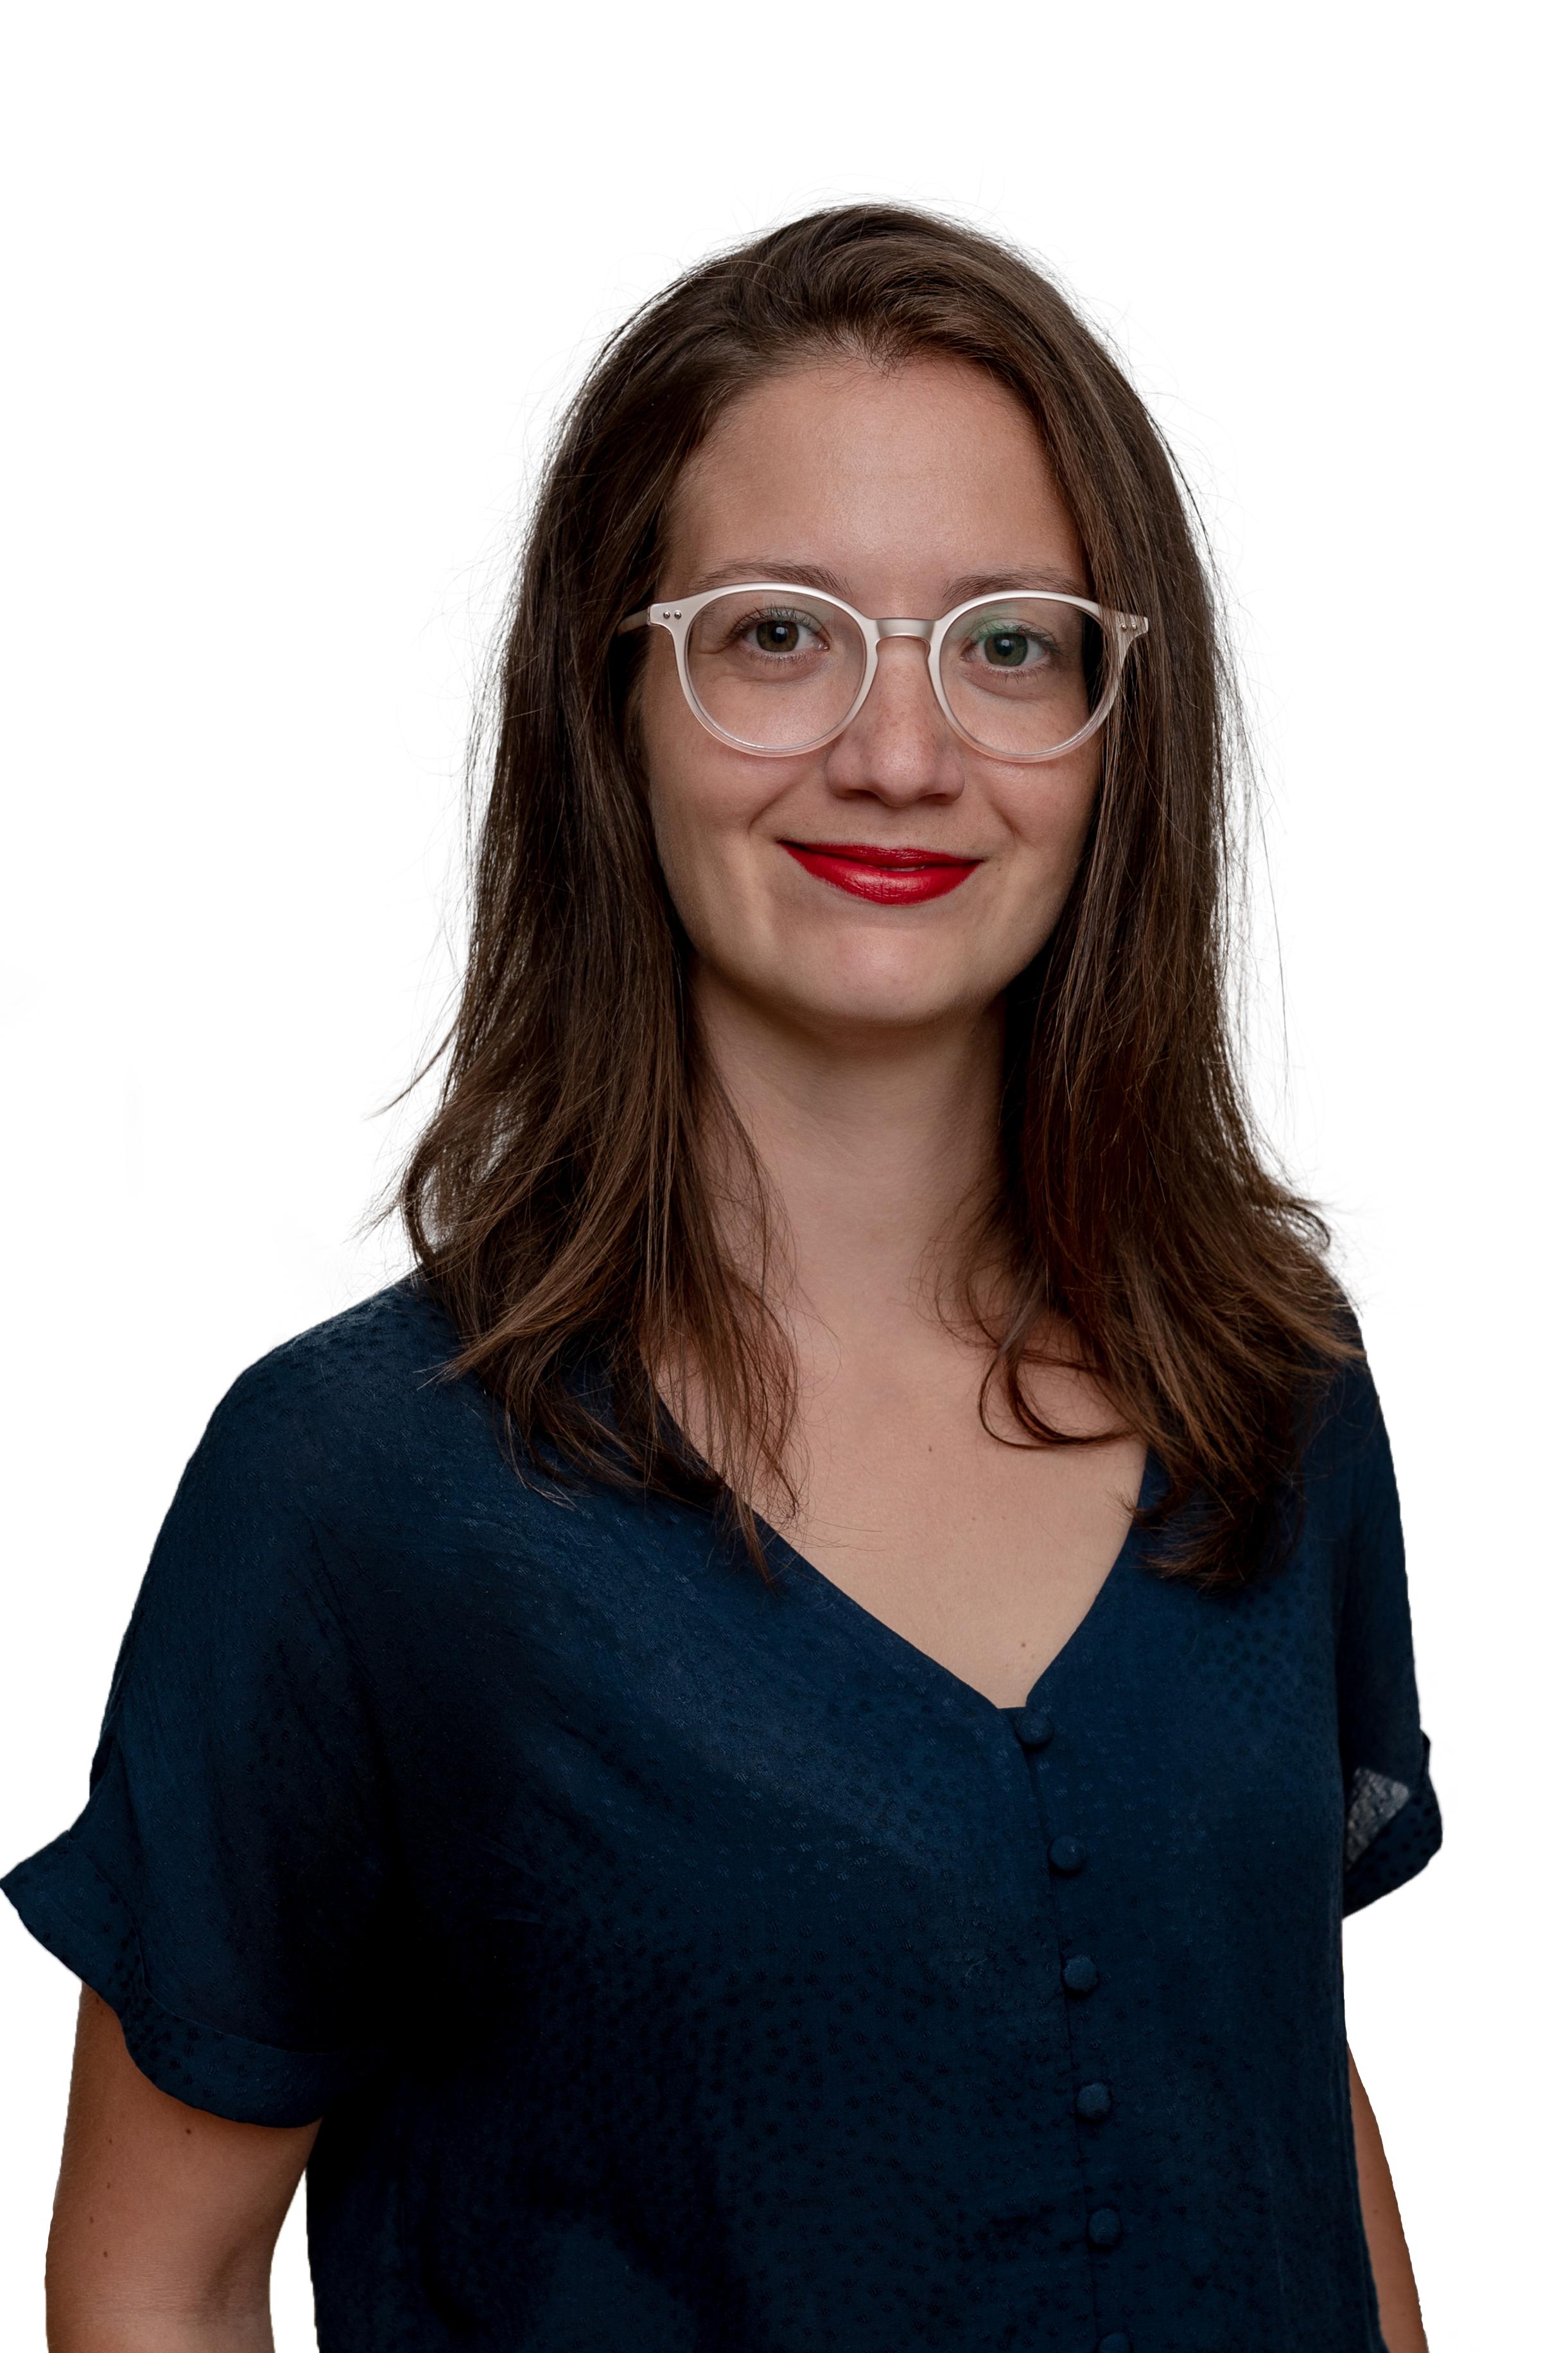 Sophie Poisson